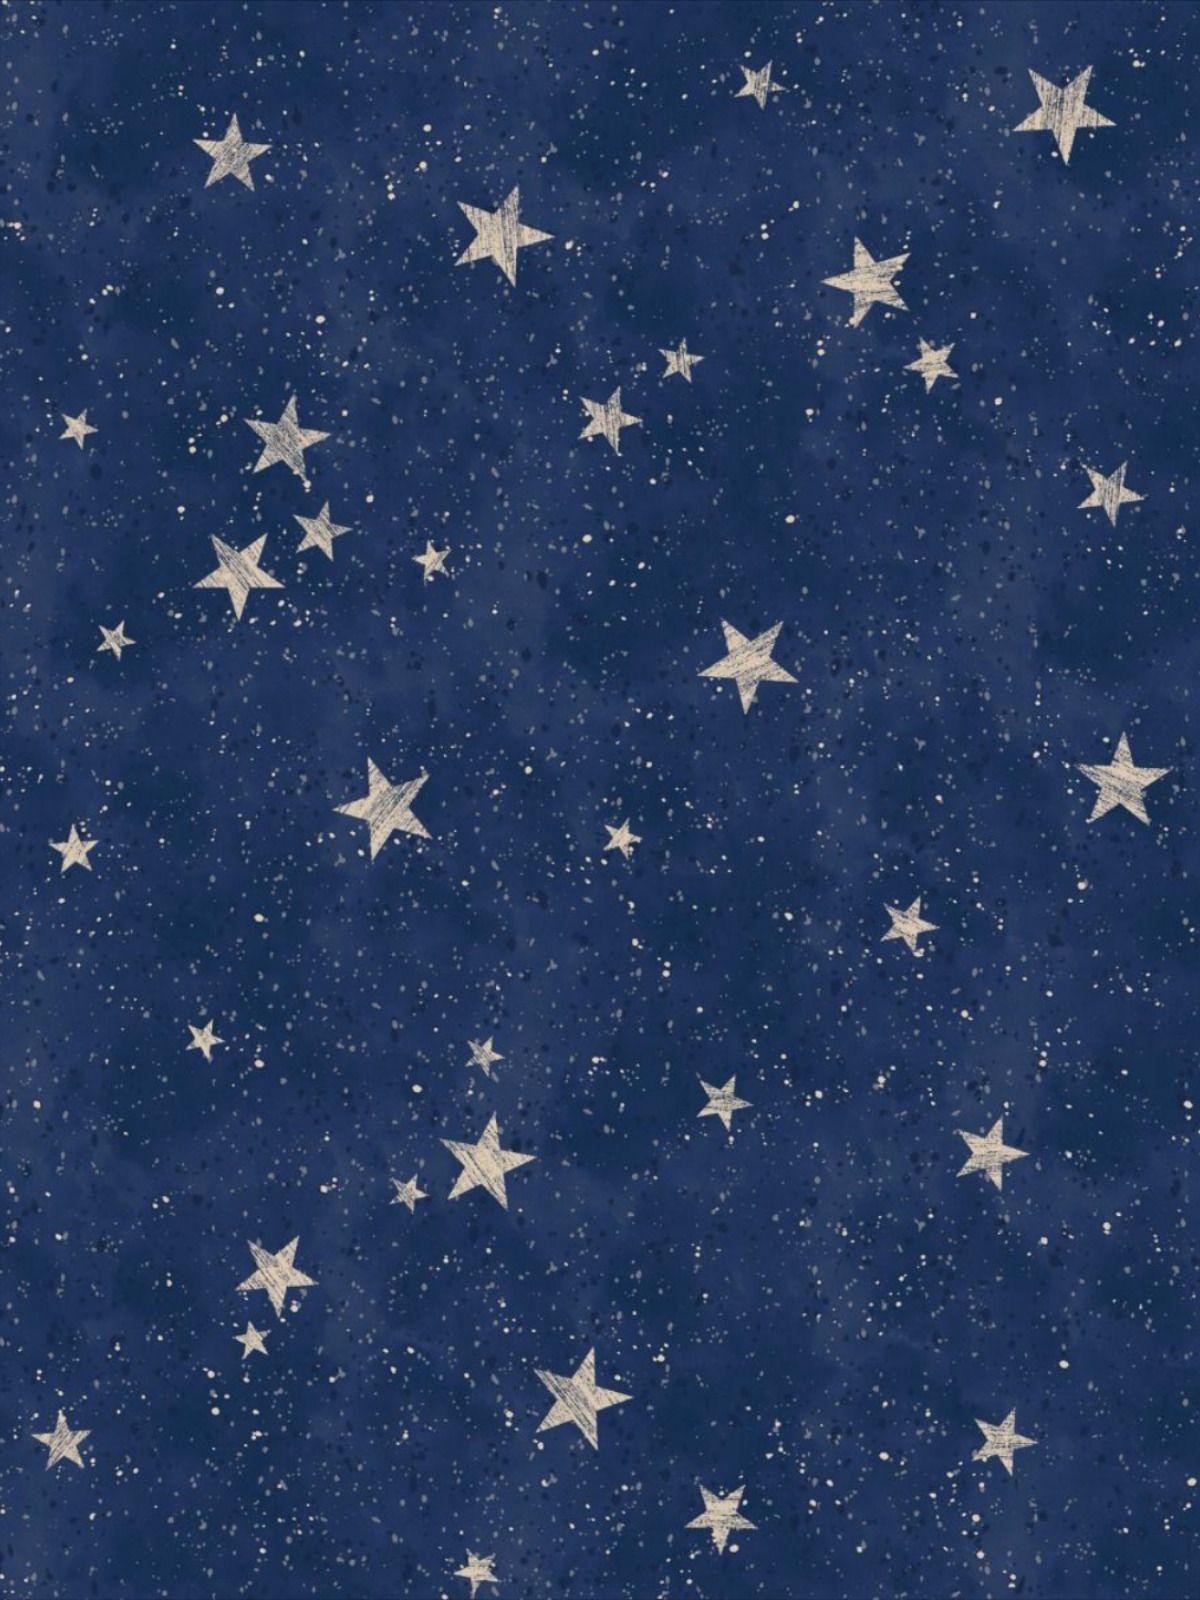 Crown Starlight Stars Wallpaper Navy / Gold M1490